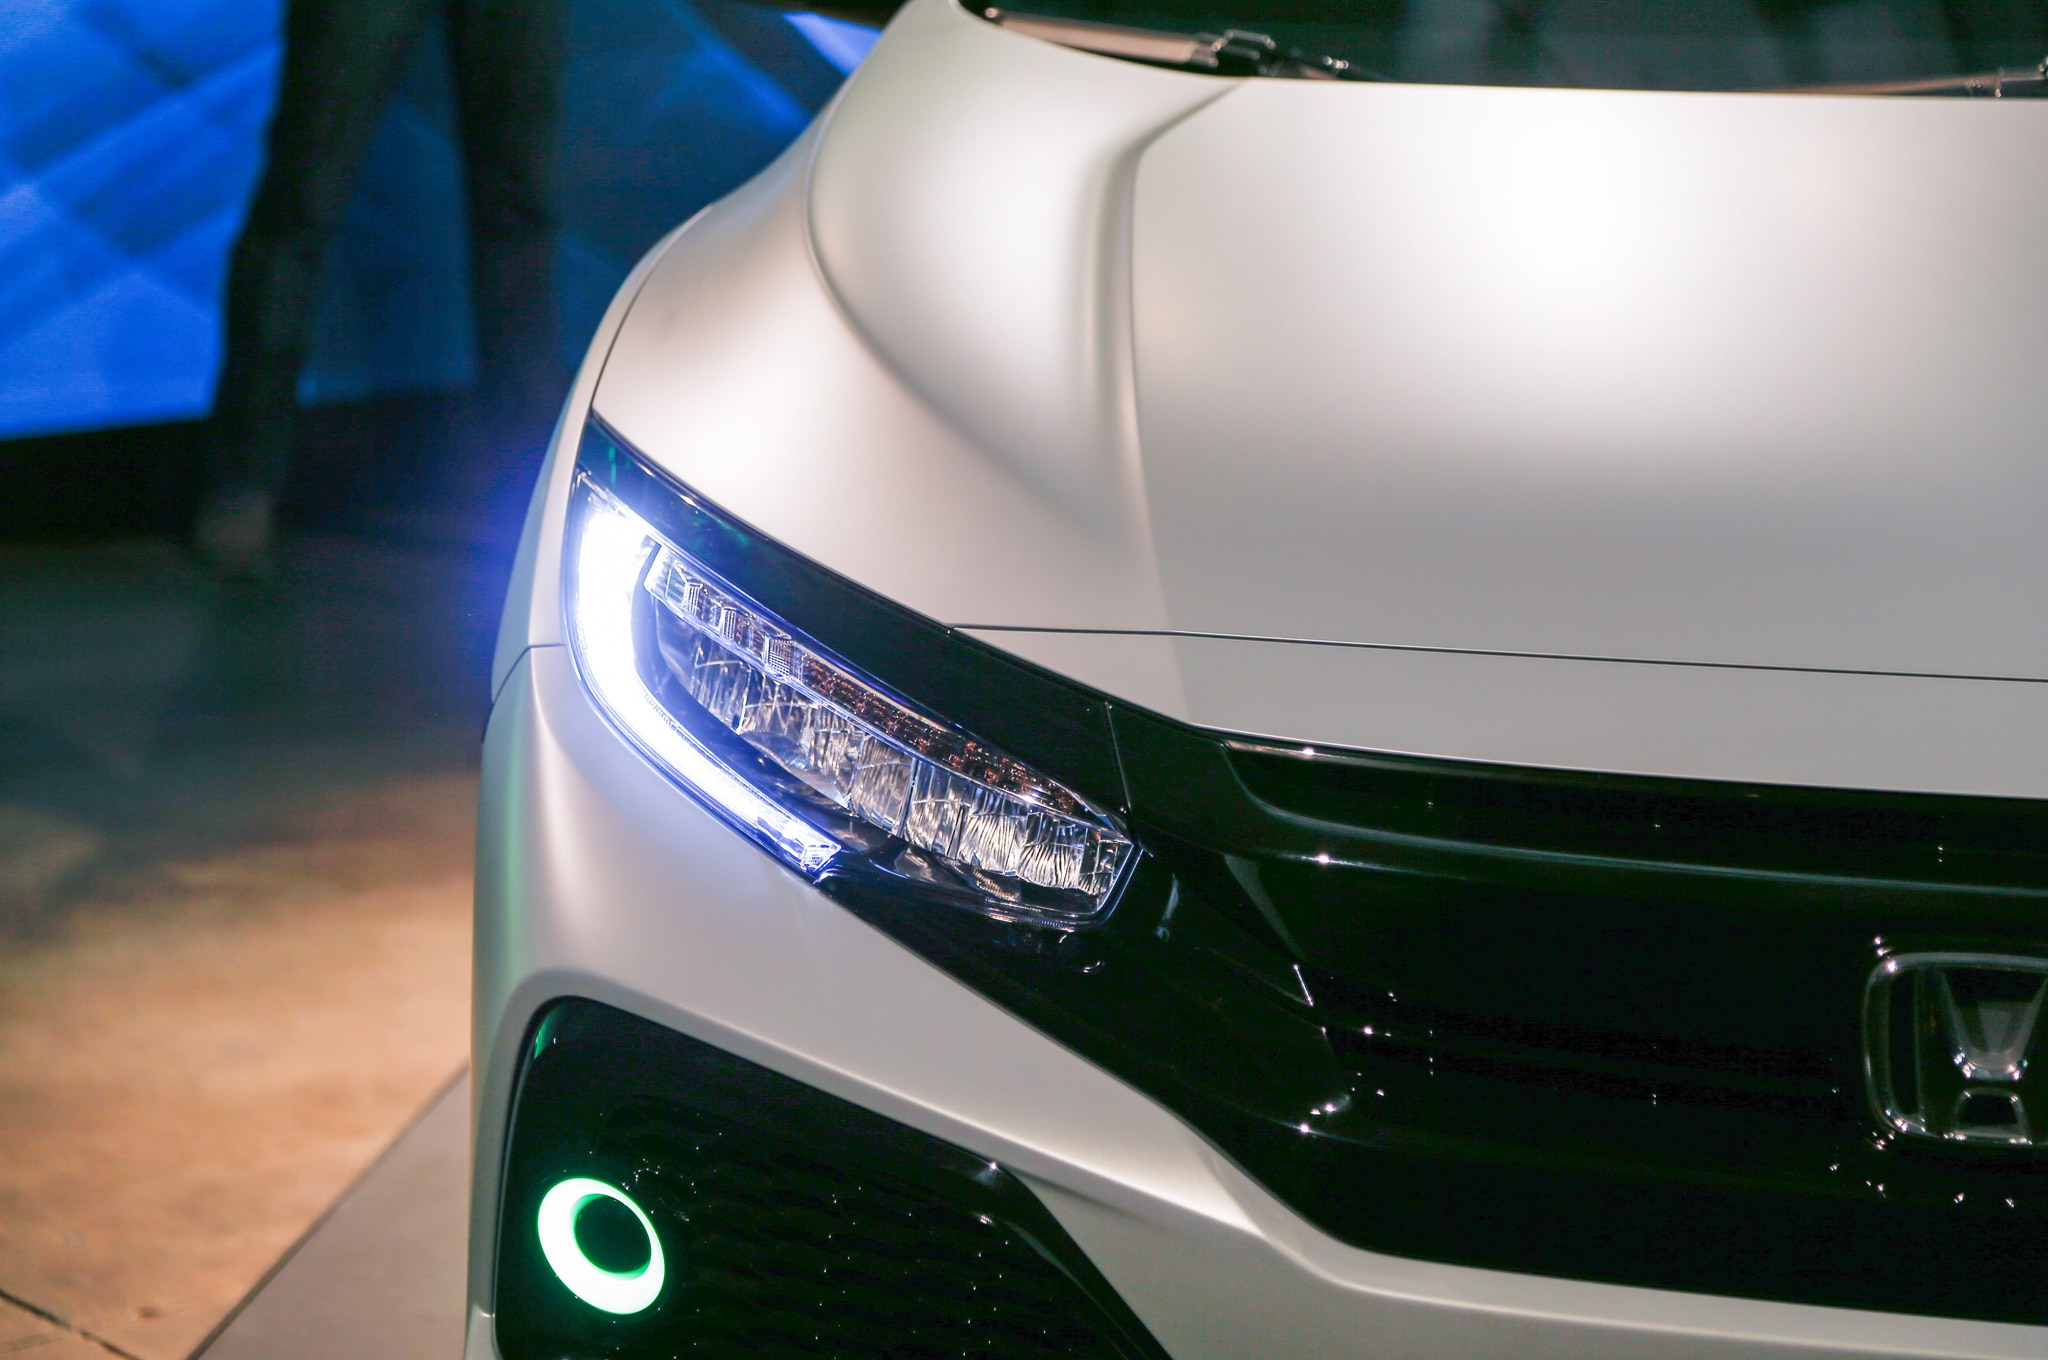 2017 Honda Civic Hatchback Prototype Revealed in New York